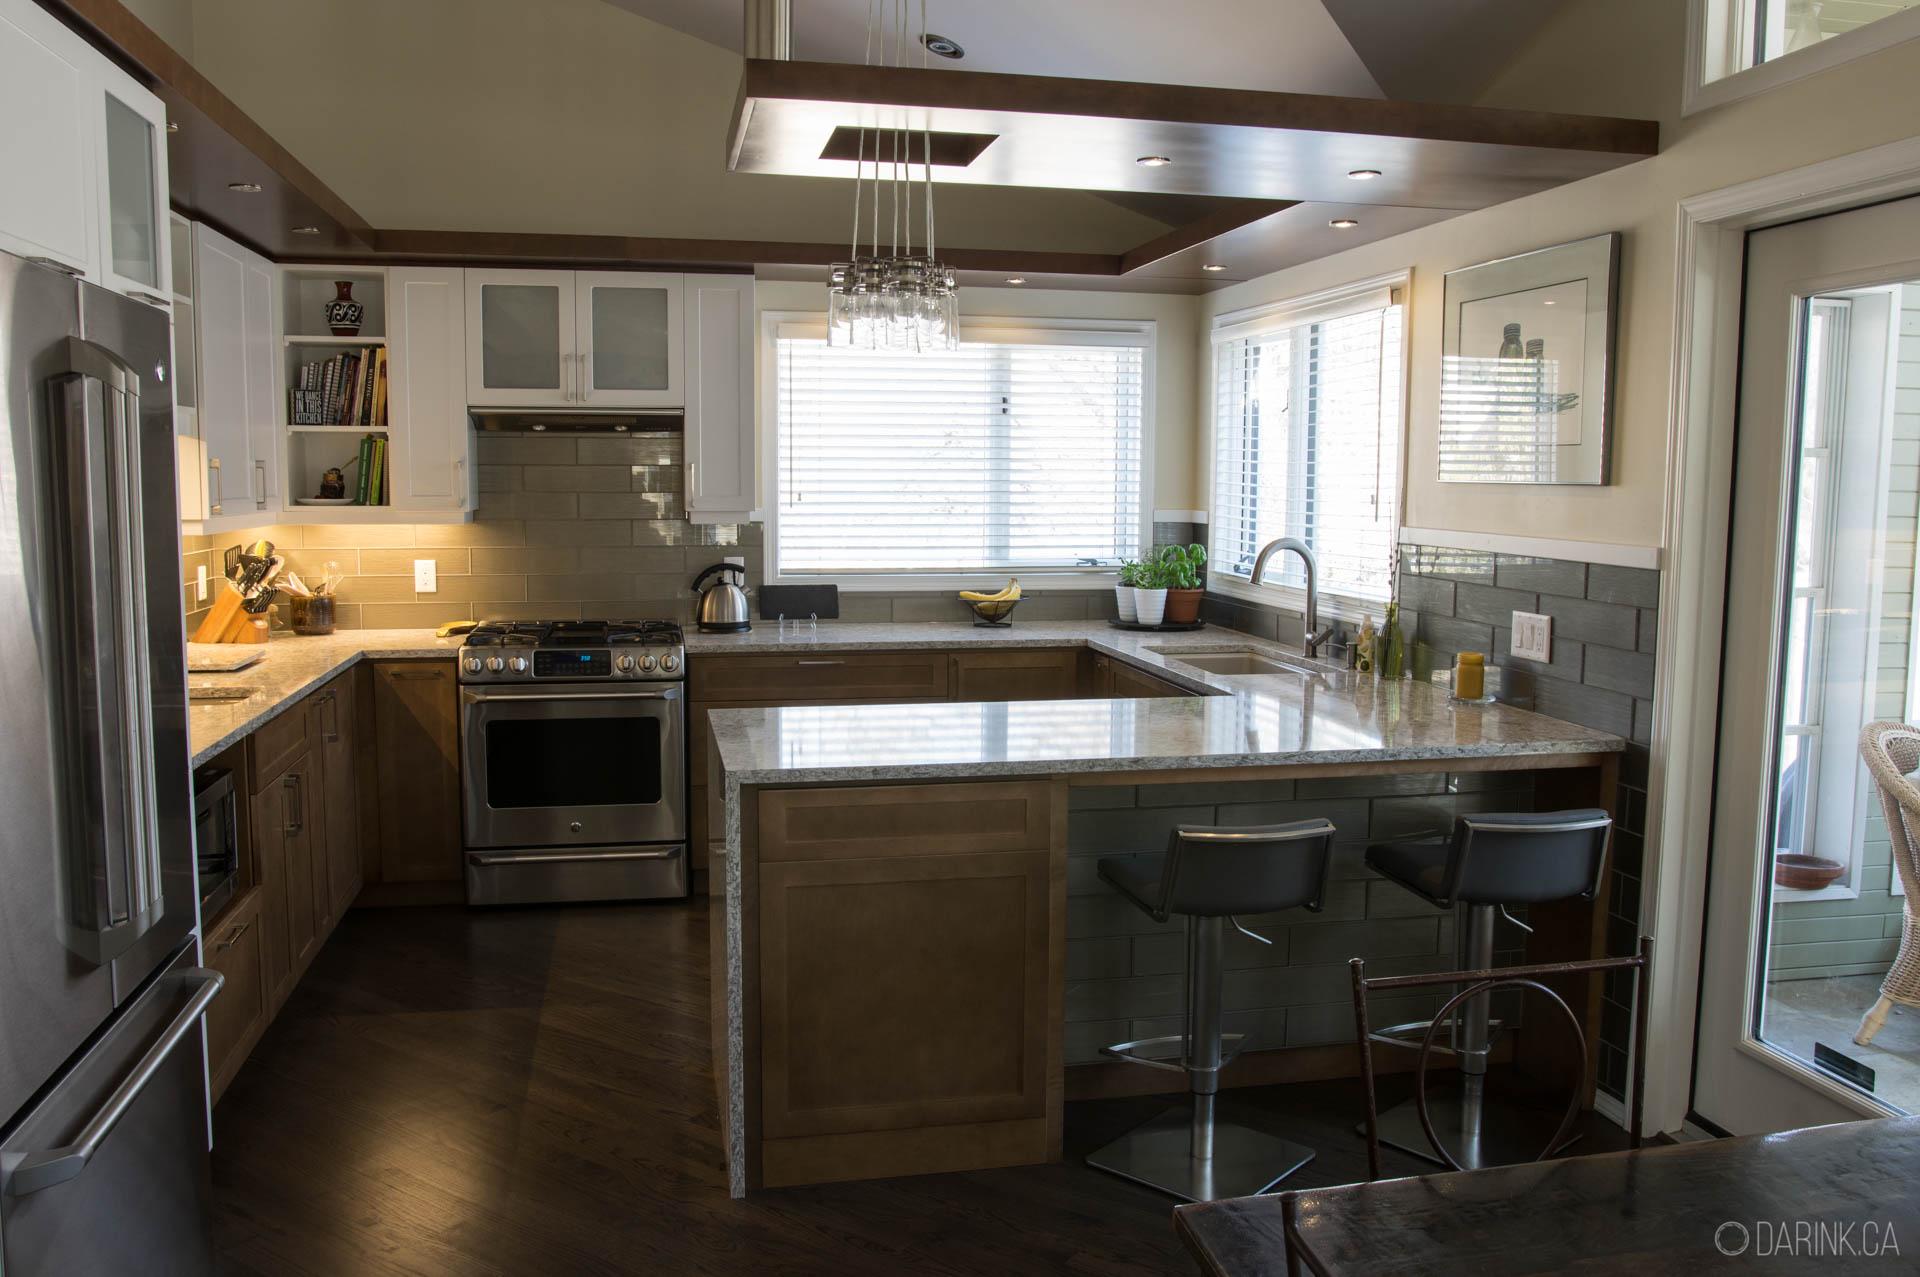 Dining Room & Kitchen Renovation